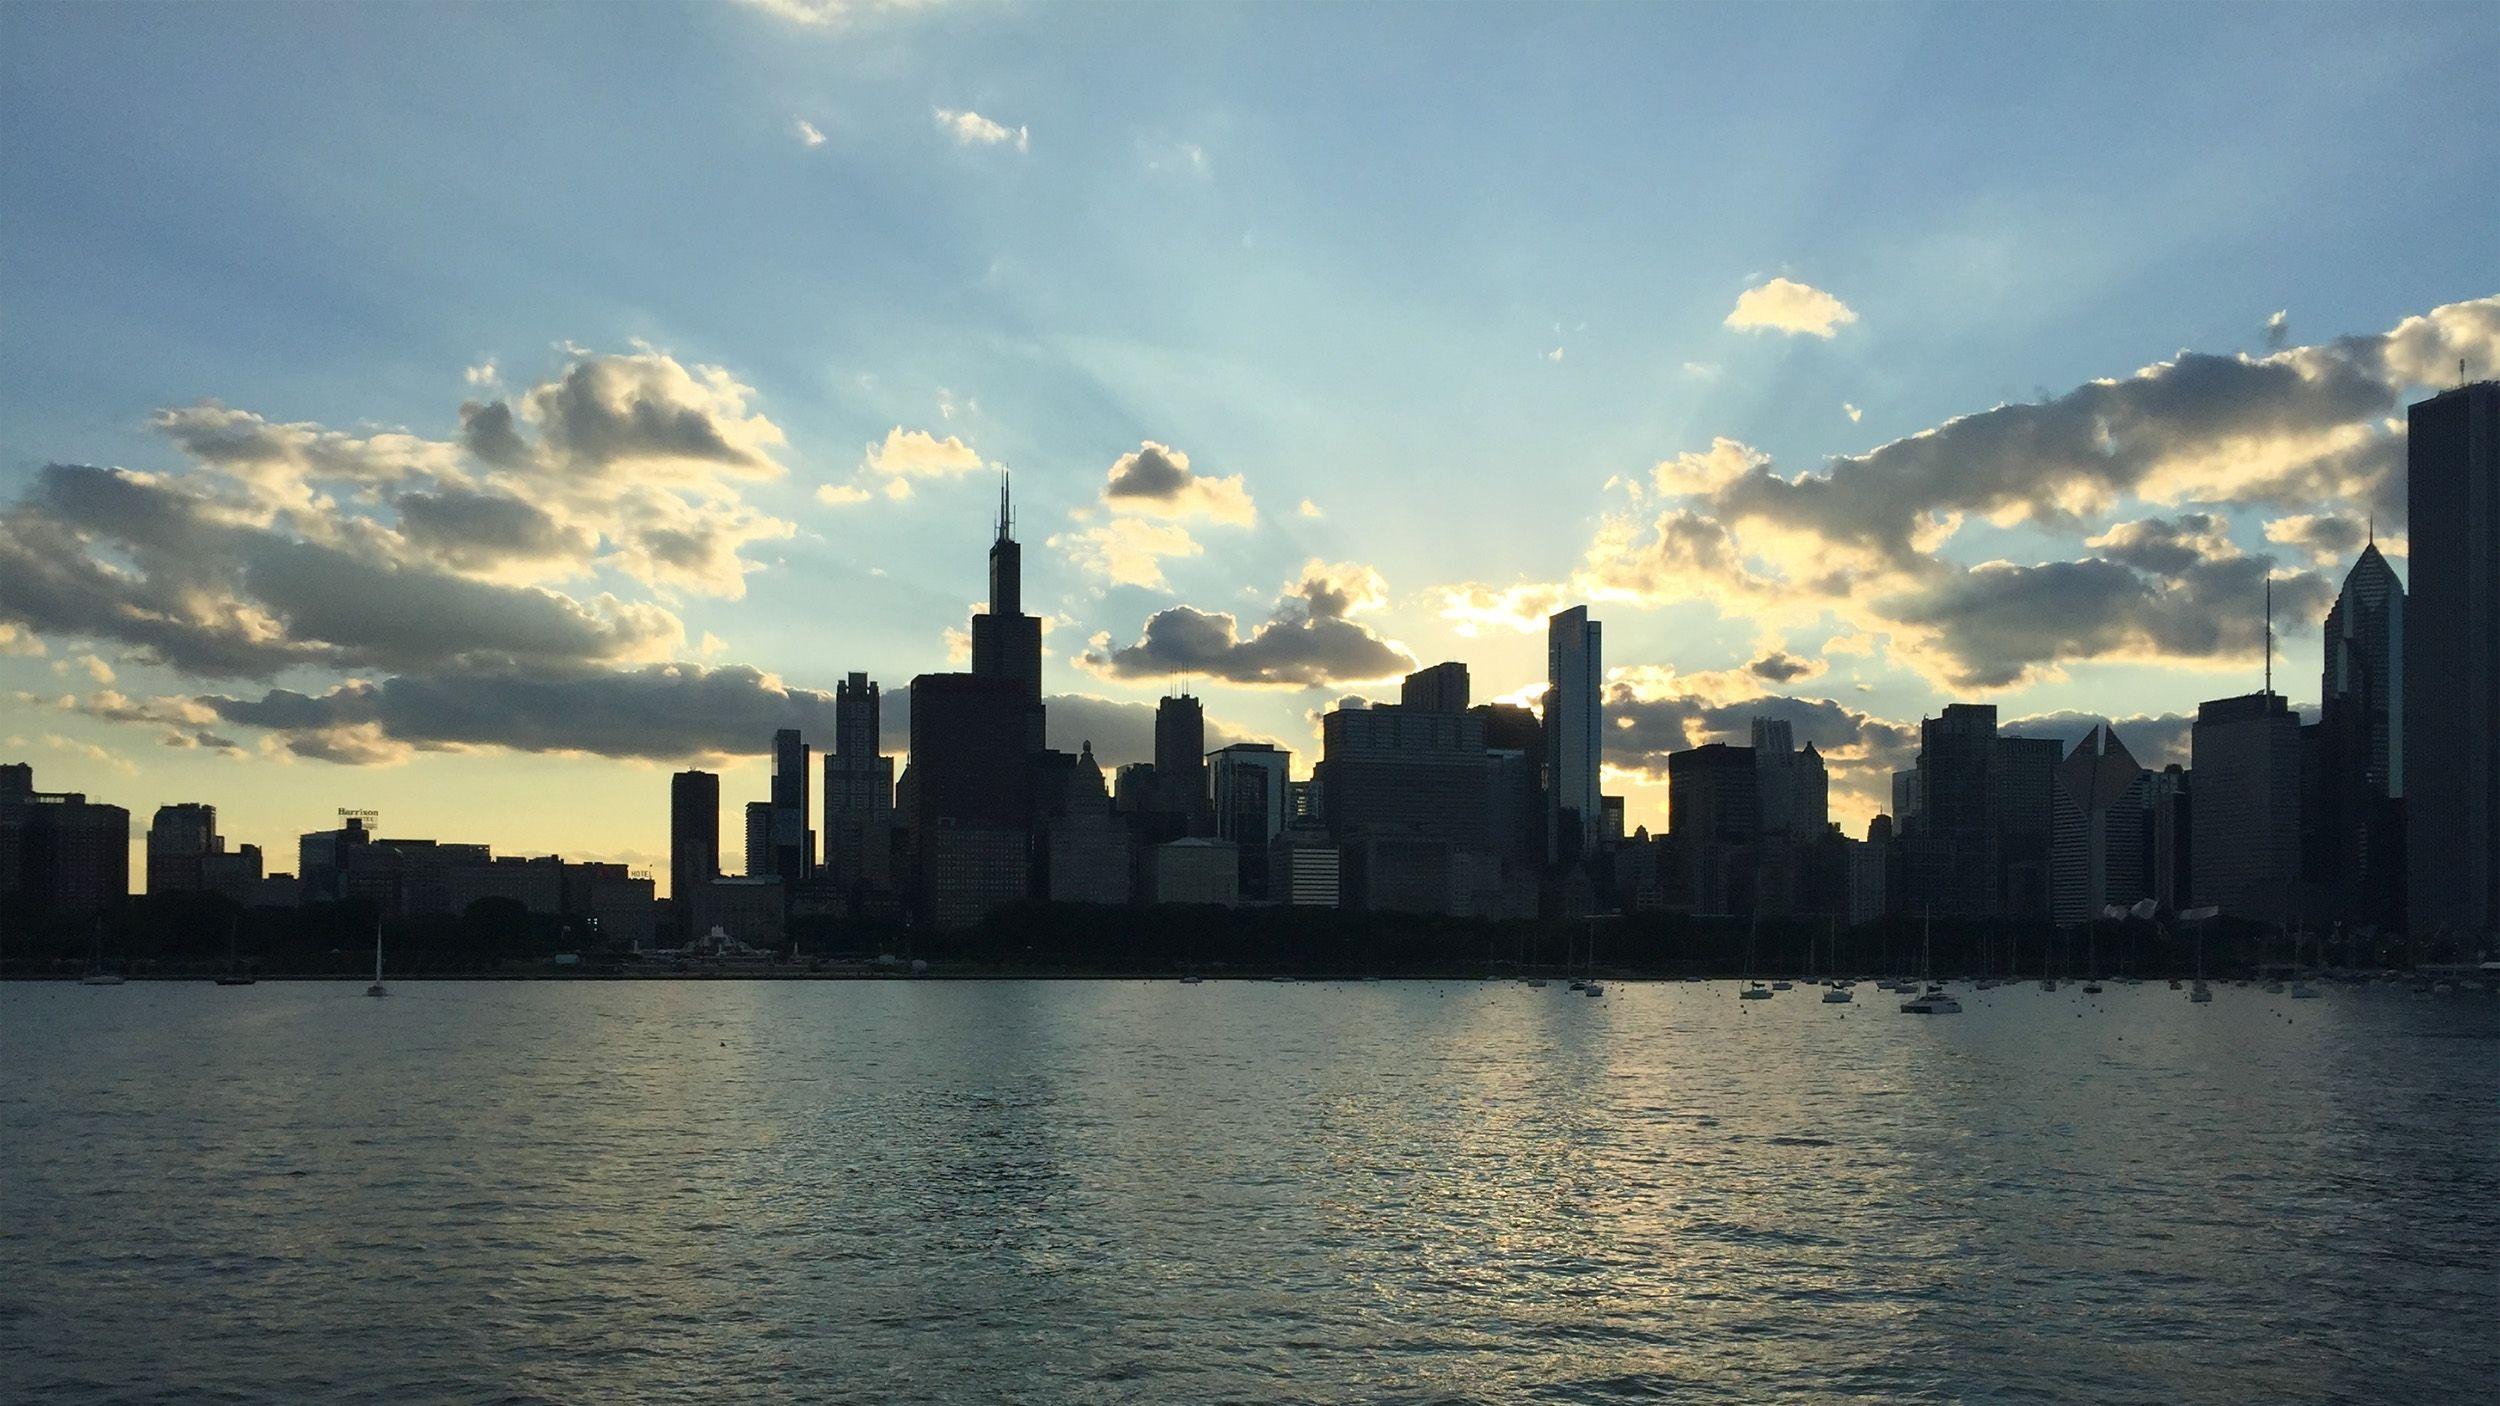 chicago_IMG_9611_16x9.jpg